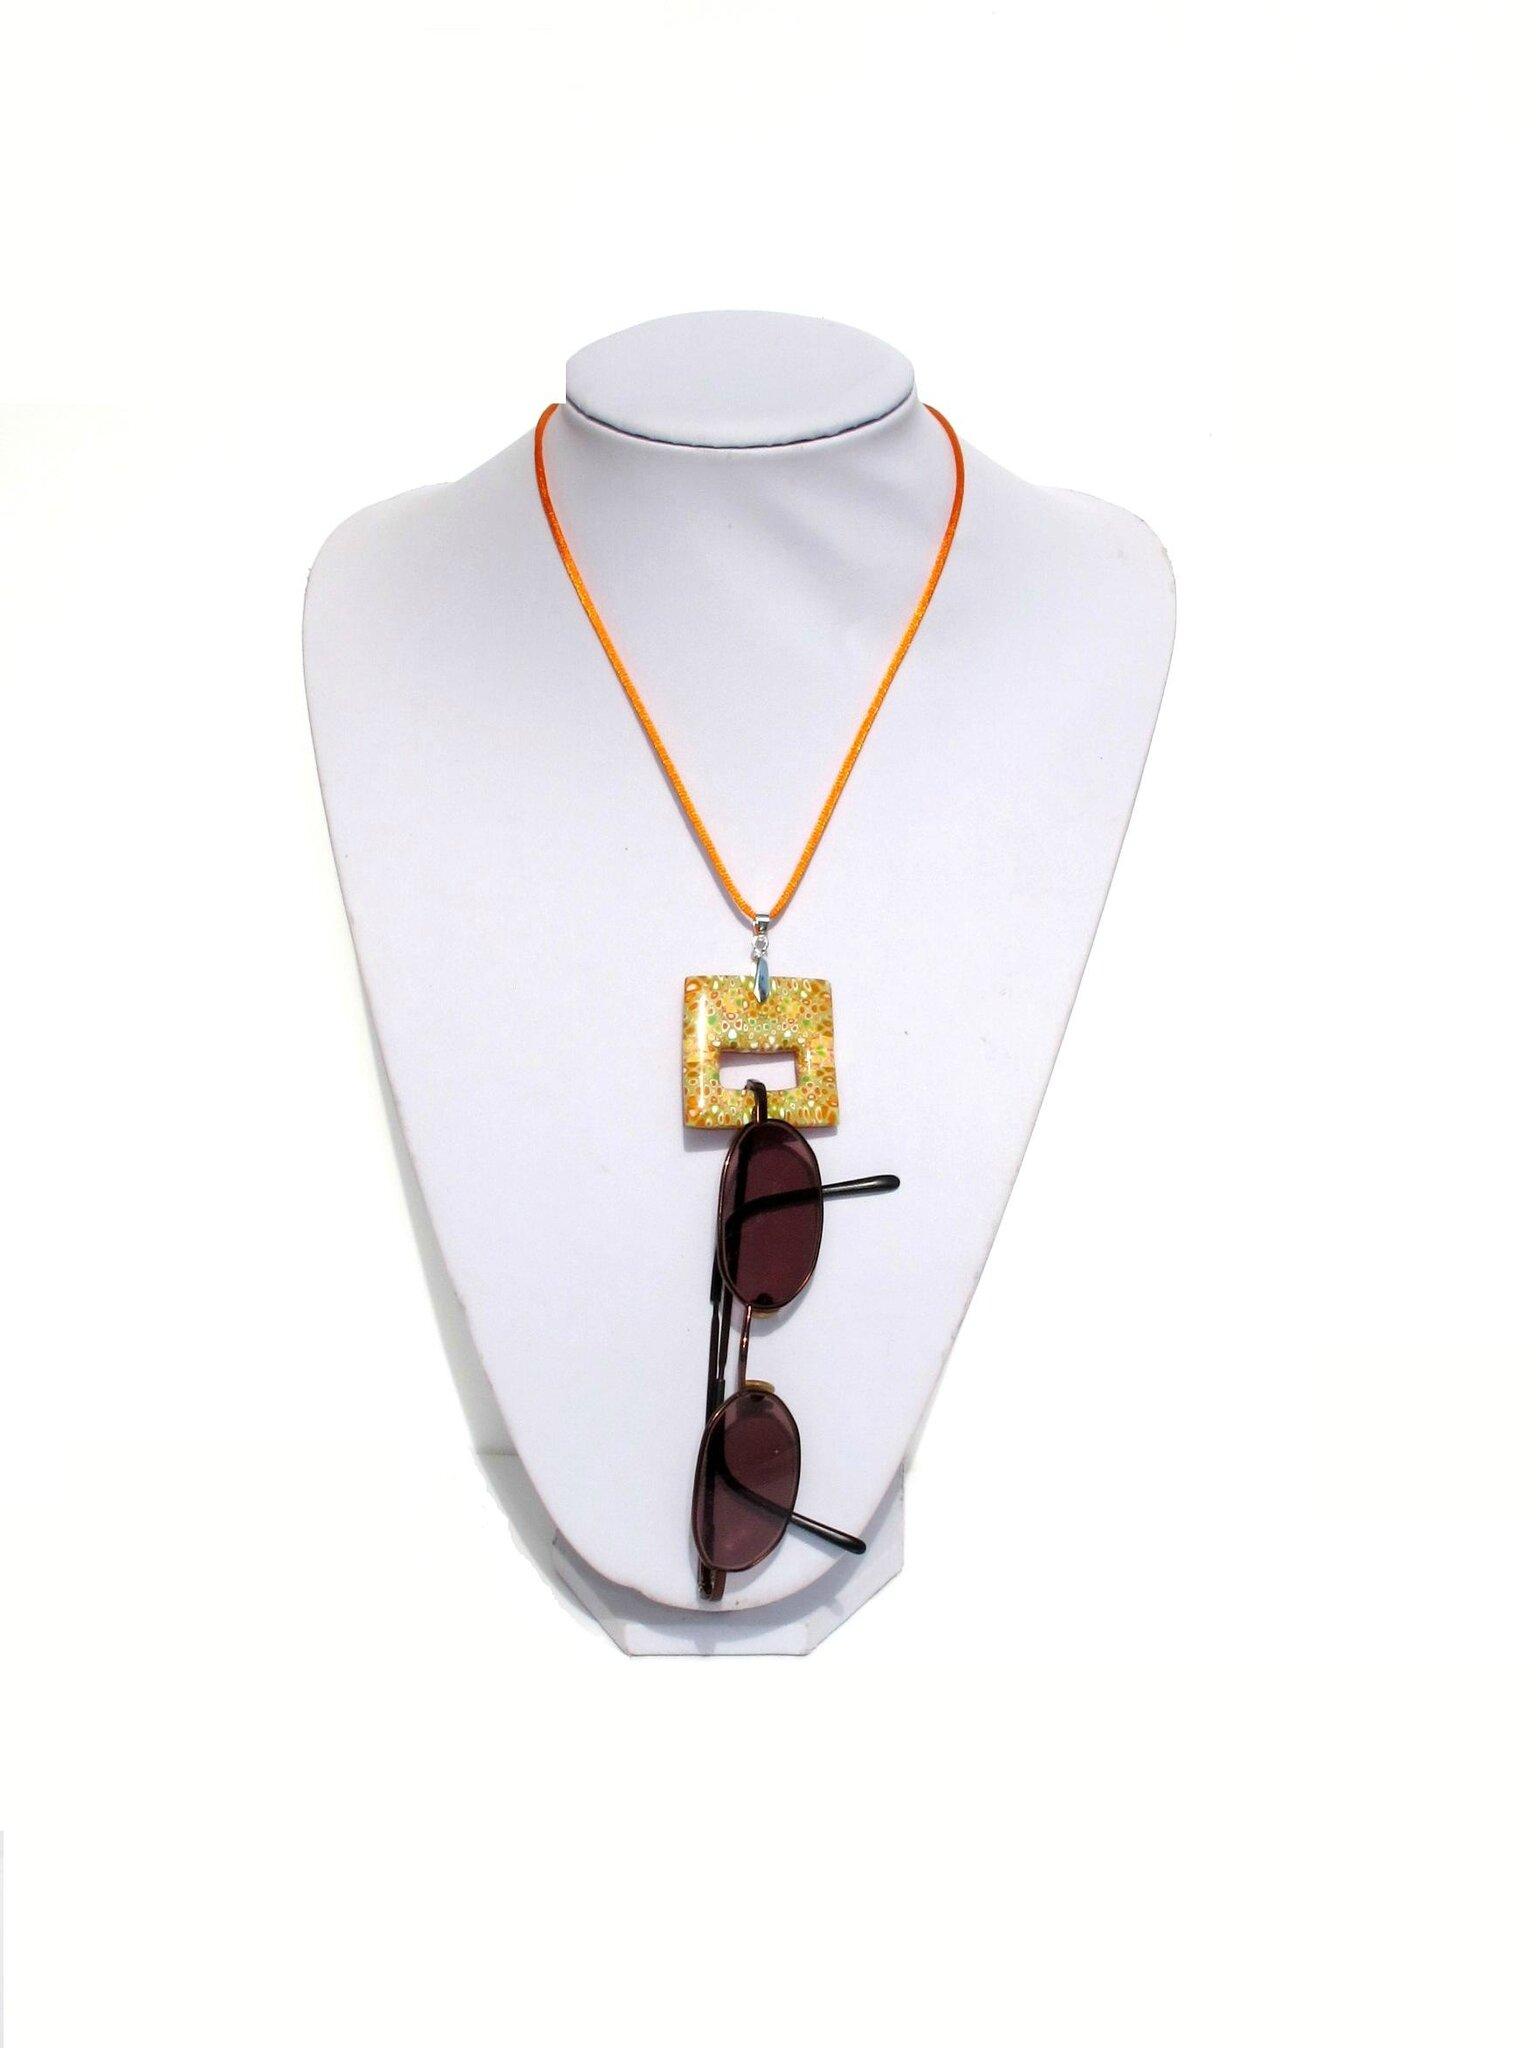 collier pendentif porte lunettes fimo carré orange vert jaune clay gun